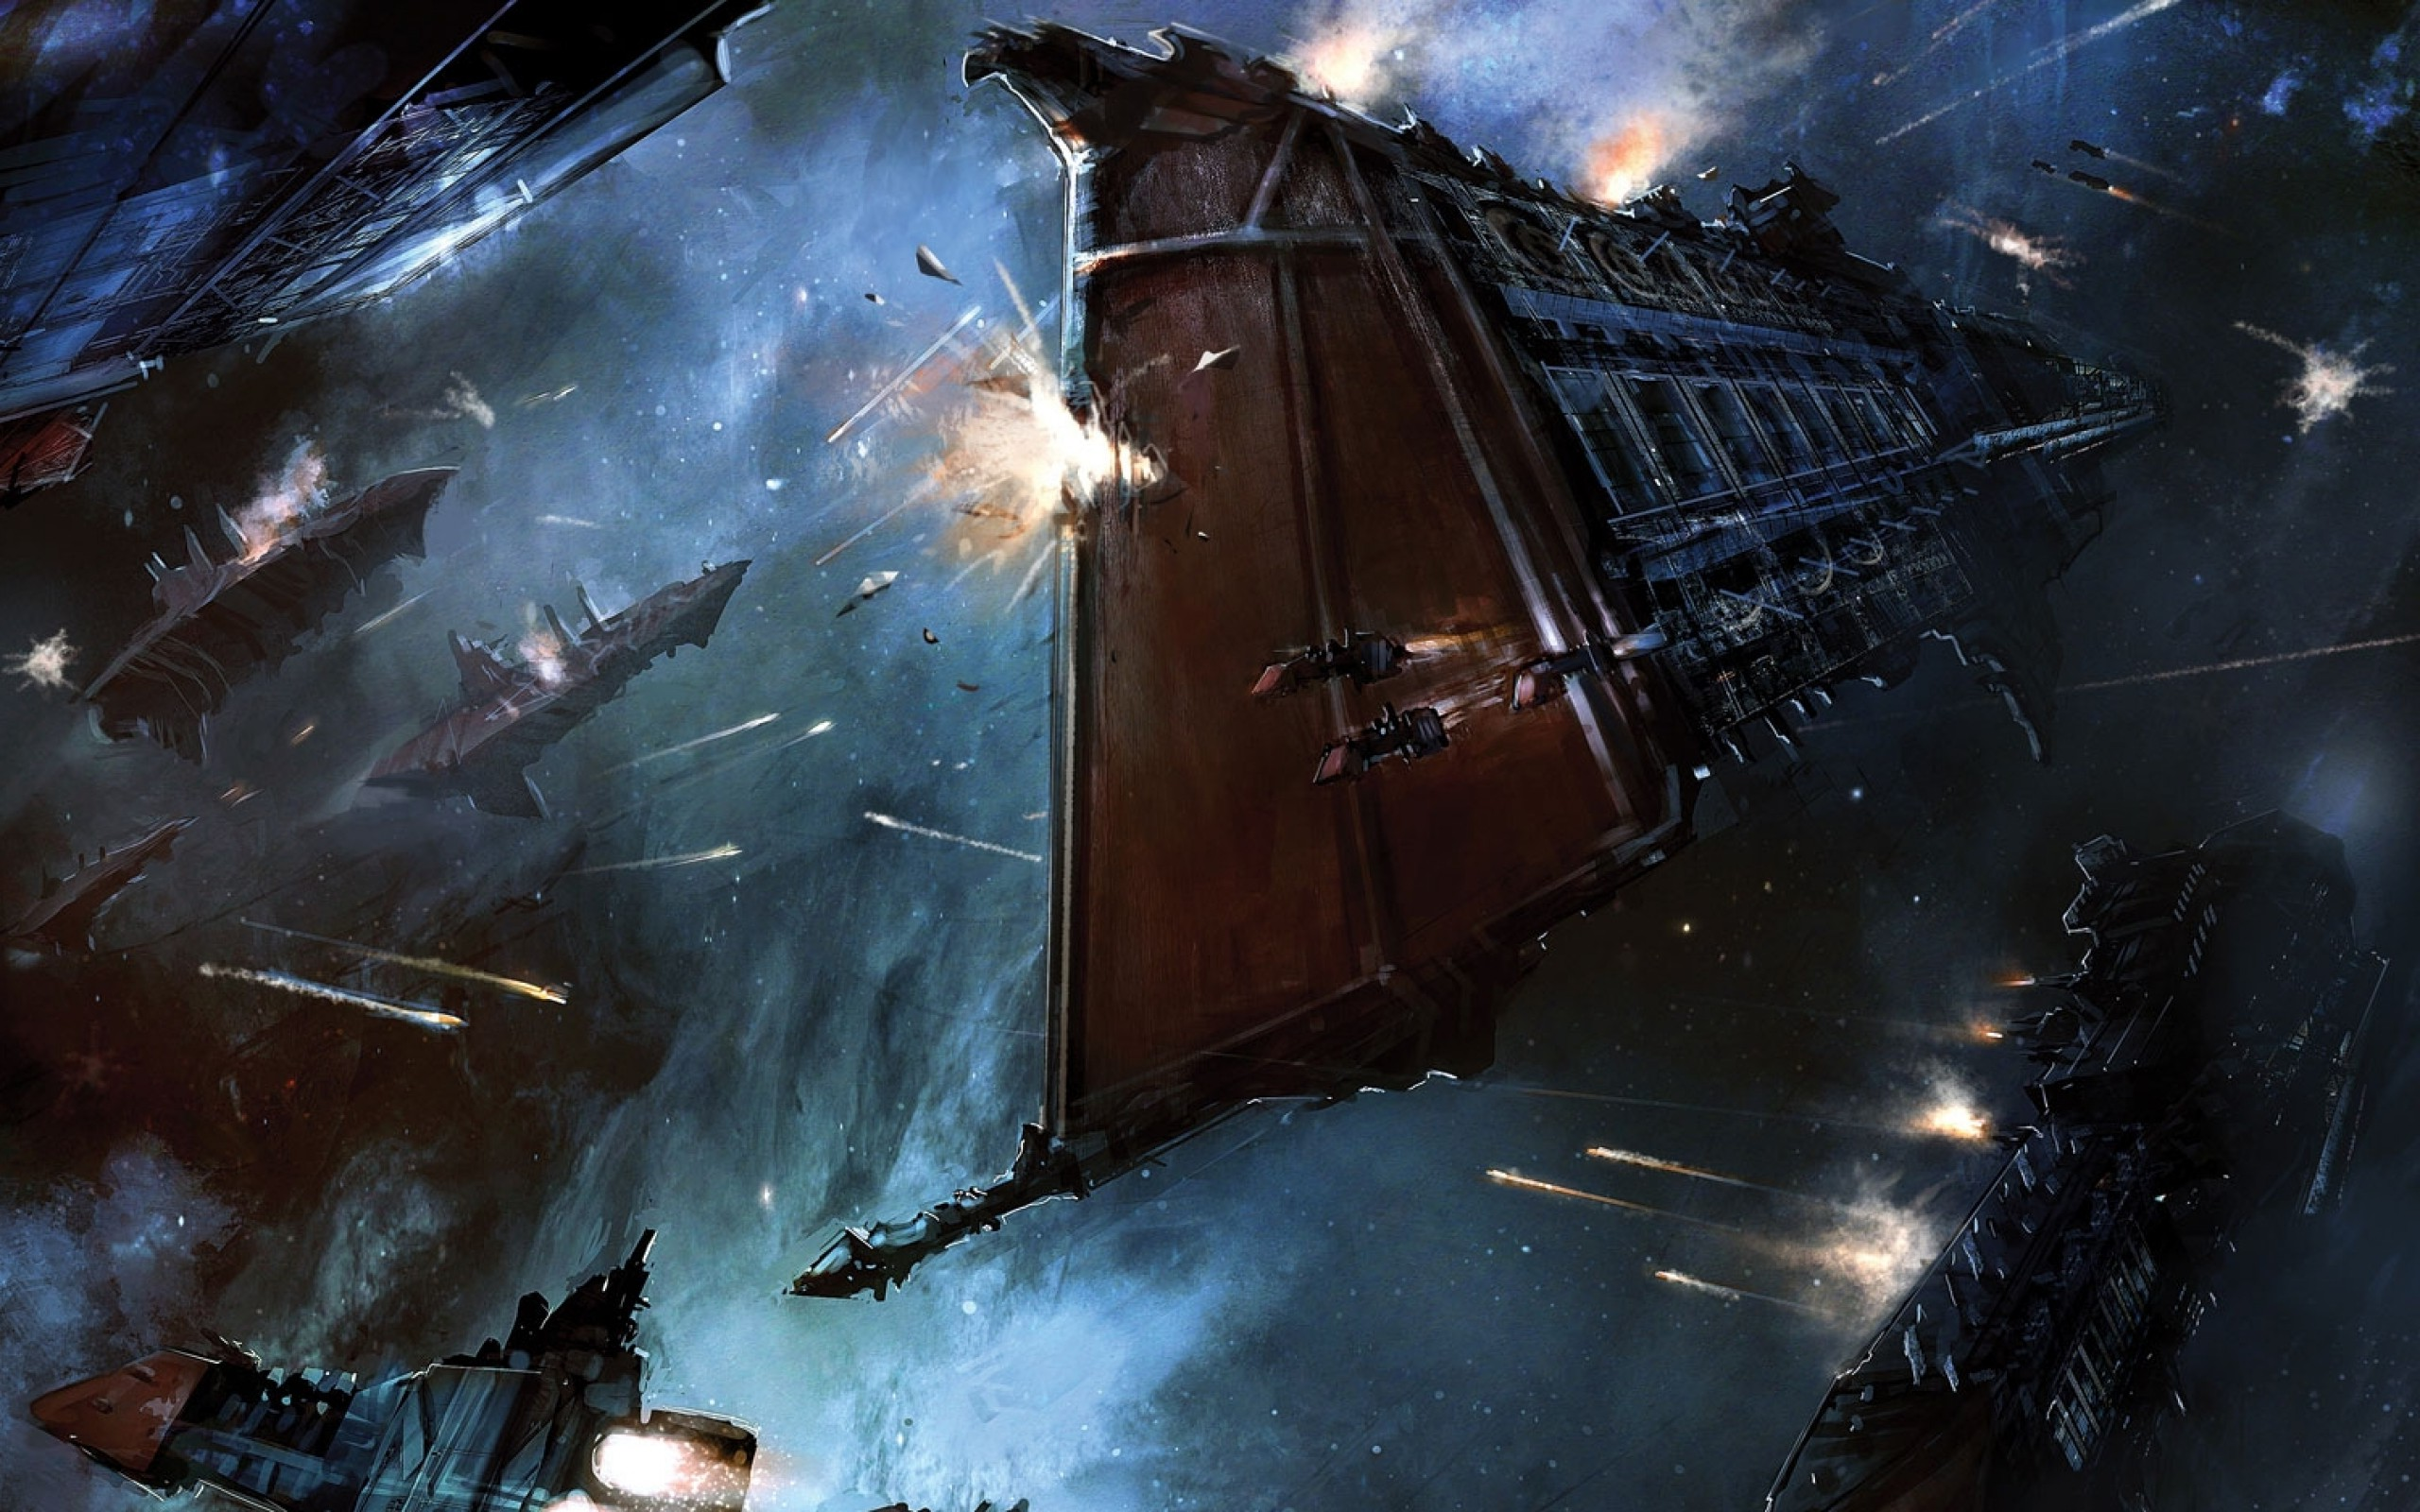 Artwork, Fantasy Art, Digital Art, Spaceship, War, - Warhammer 40k Ship Art , HD Wallpaper & Backgrounds